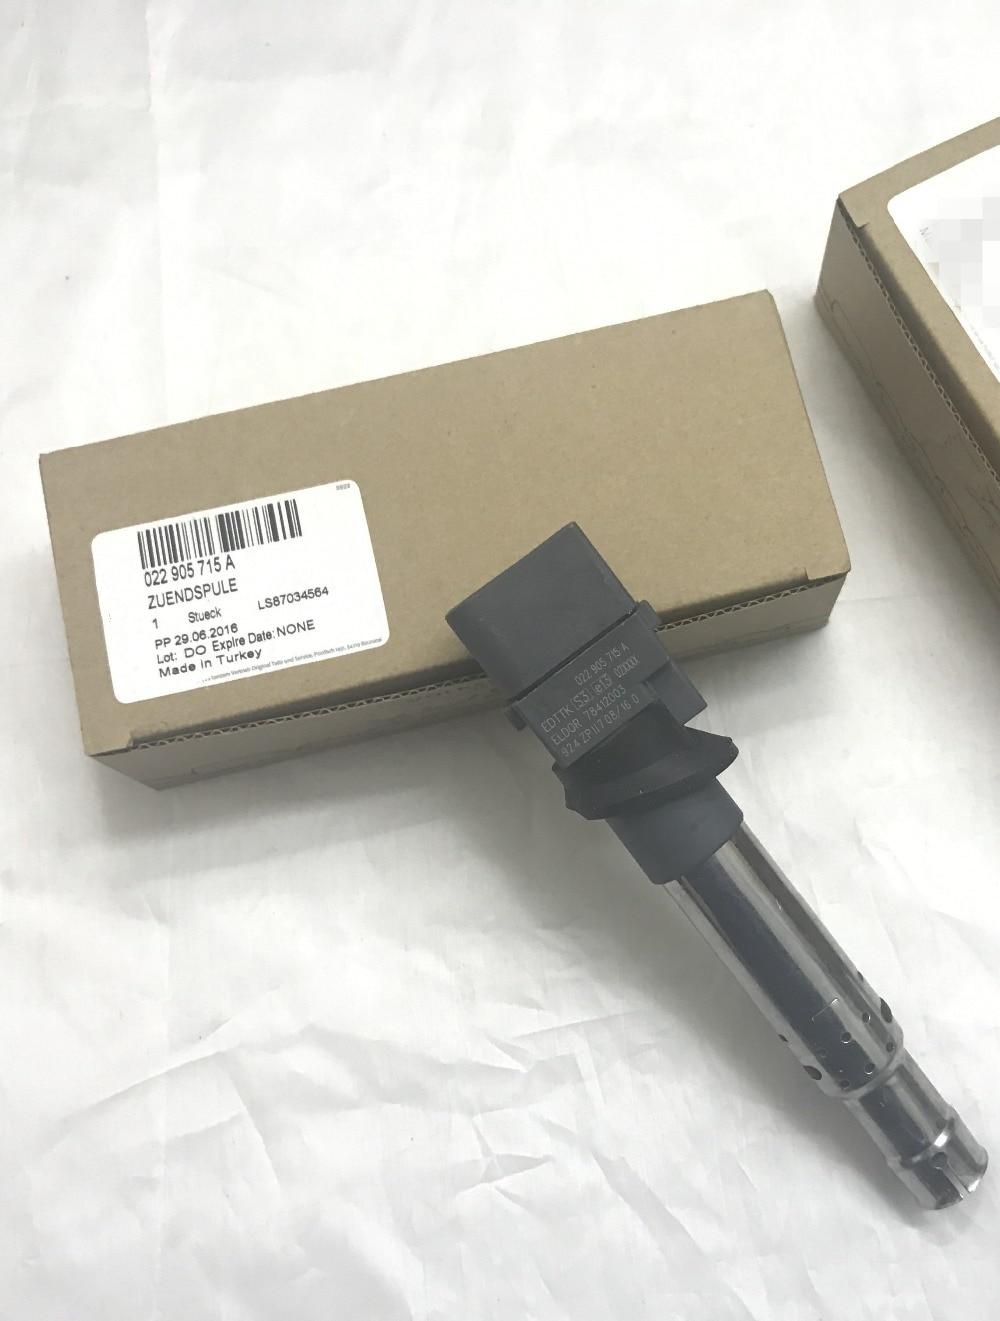 New 2pcs Genuine Ignition Coils Fit For AUDI Q7 VW Passat R36 CC Touareg SUPERB 3.2 3.6 VR6 FSI 022905715